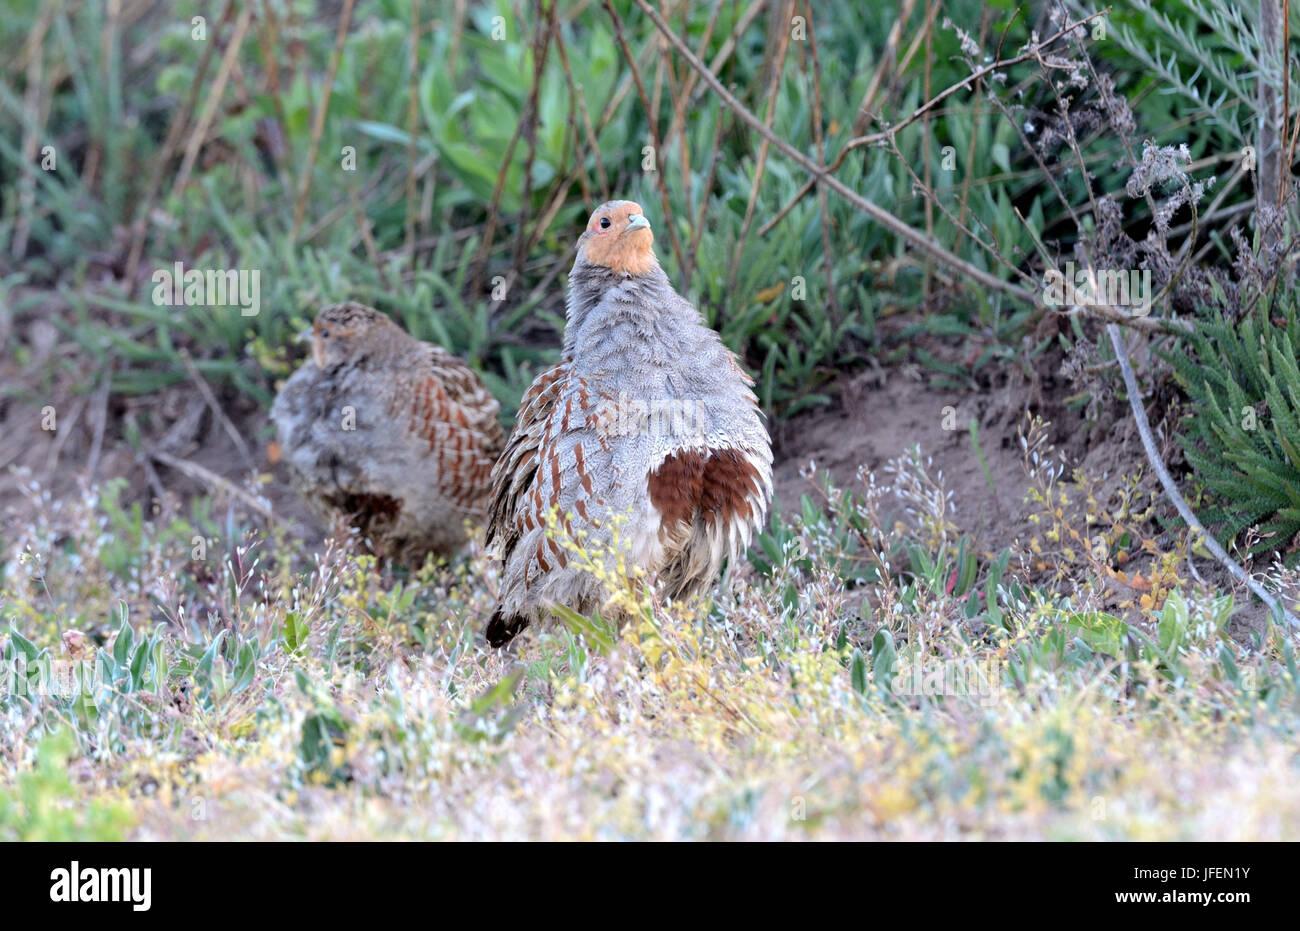 Partridges - Stock Image